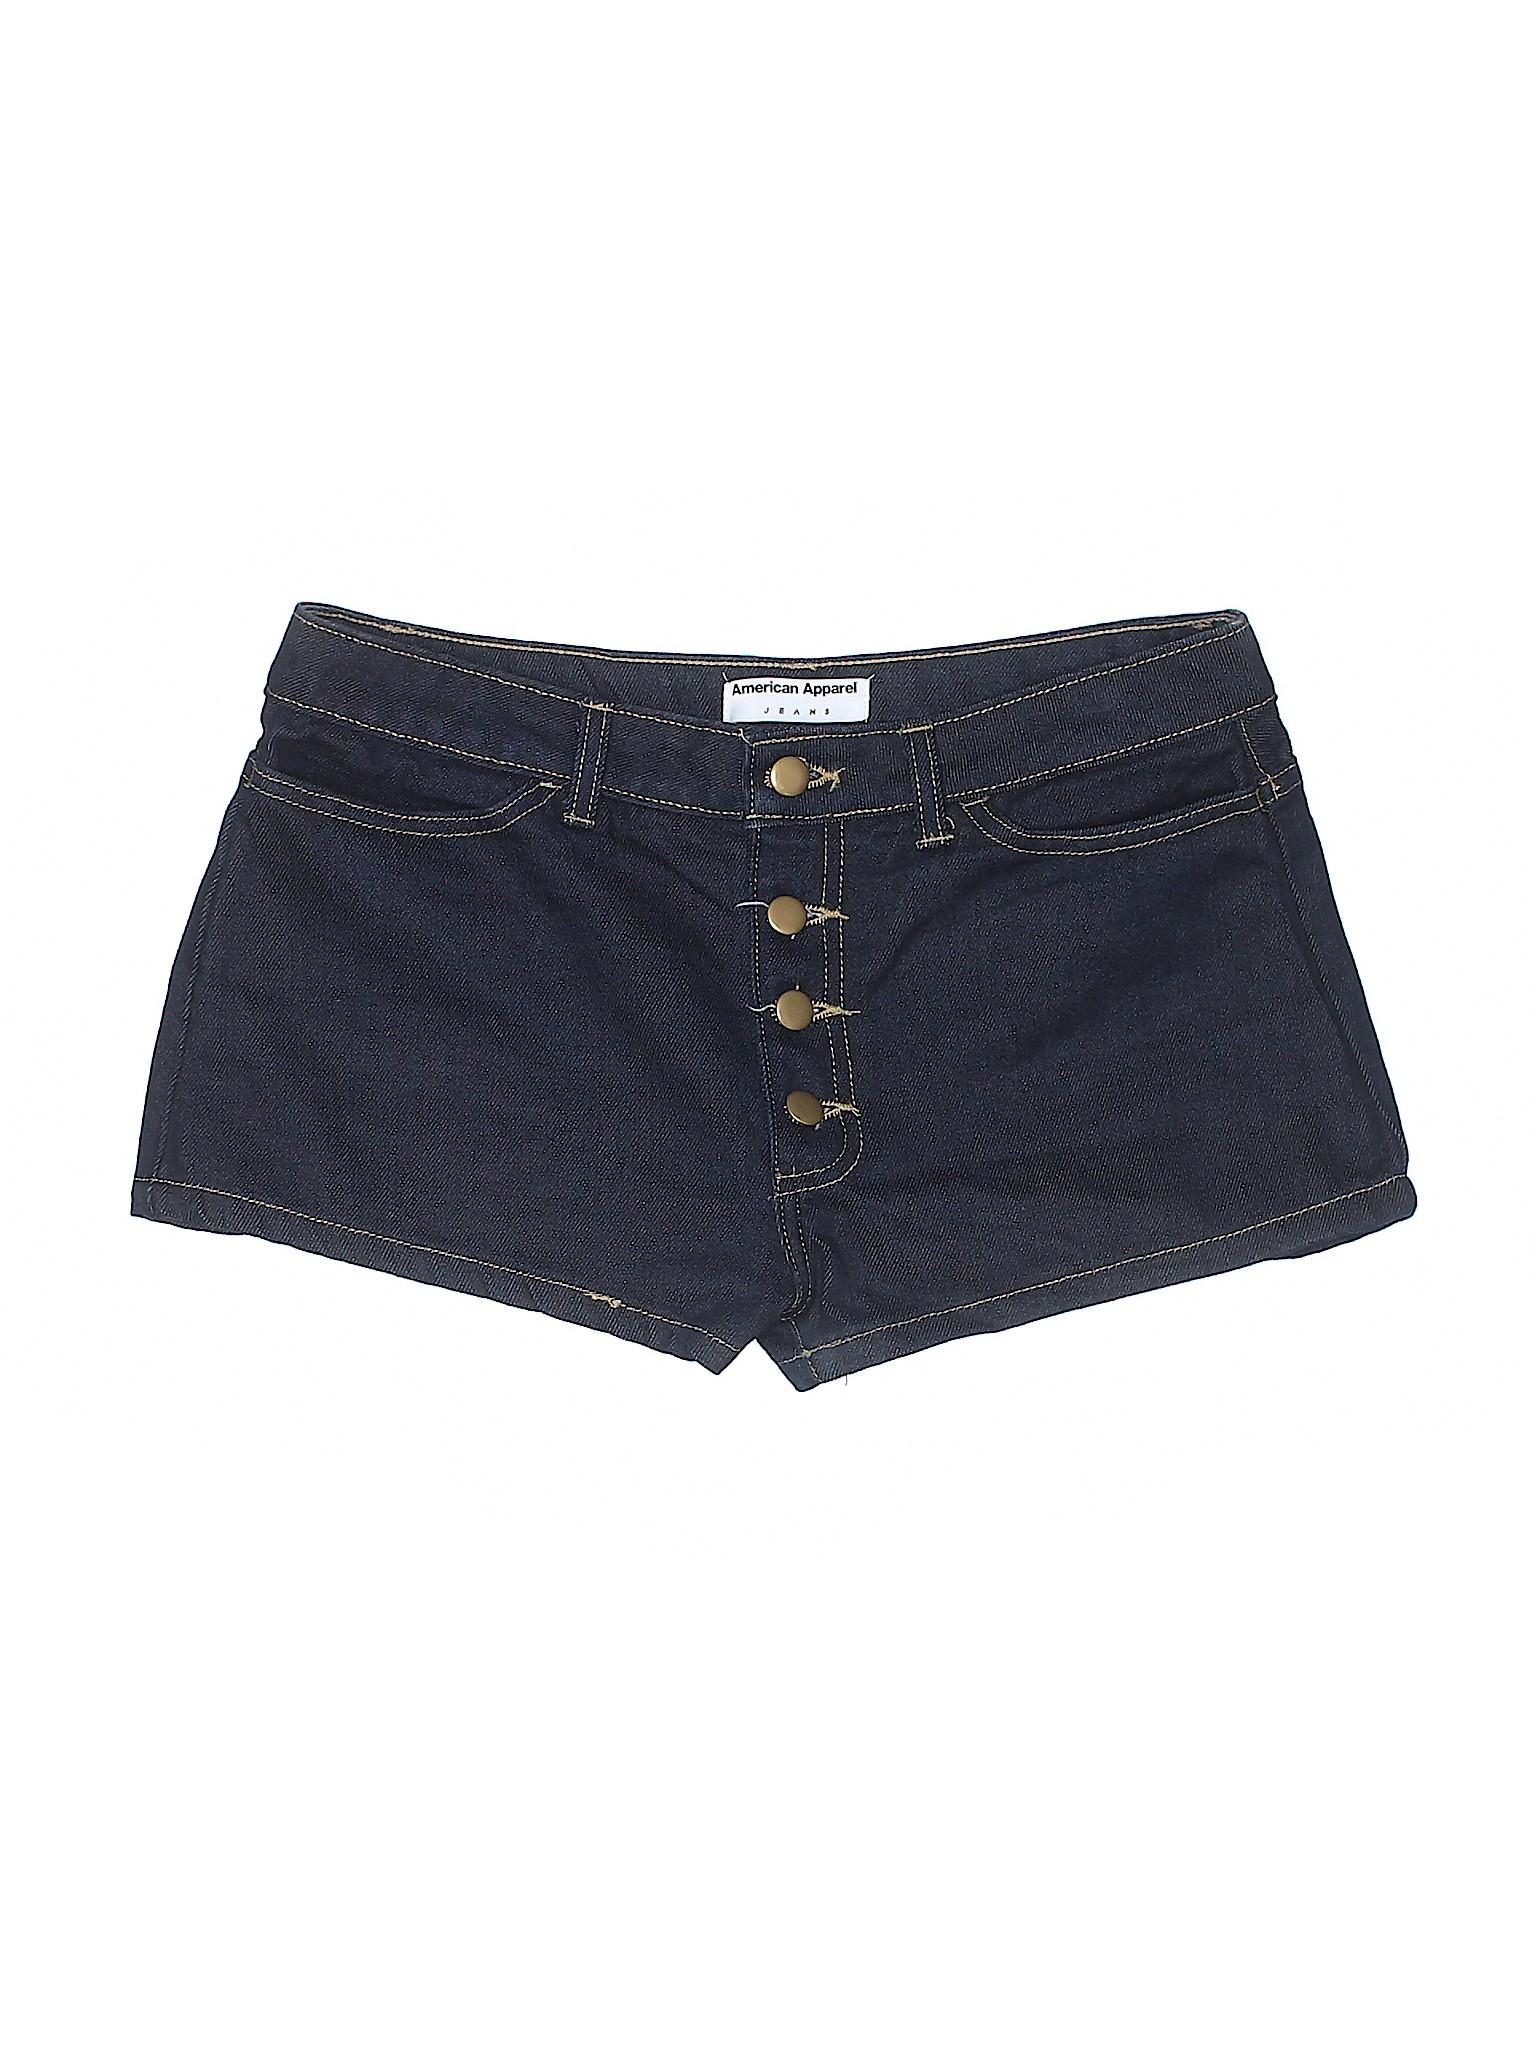 Apparel Denim Boutique Shorts leisure American ZgqnpaX